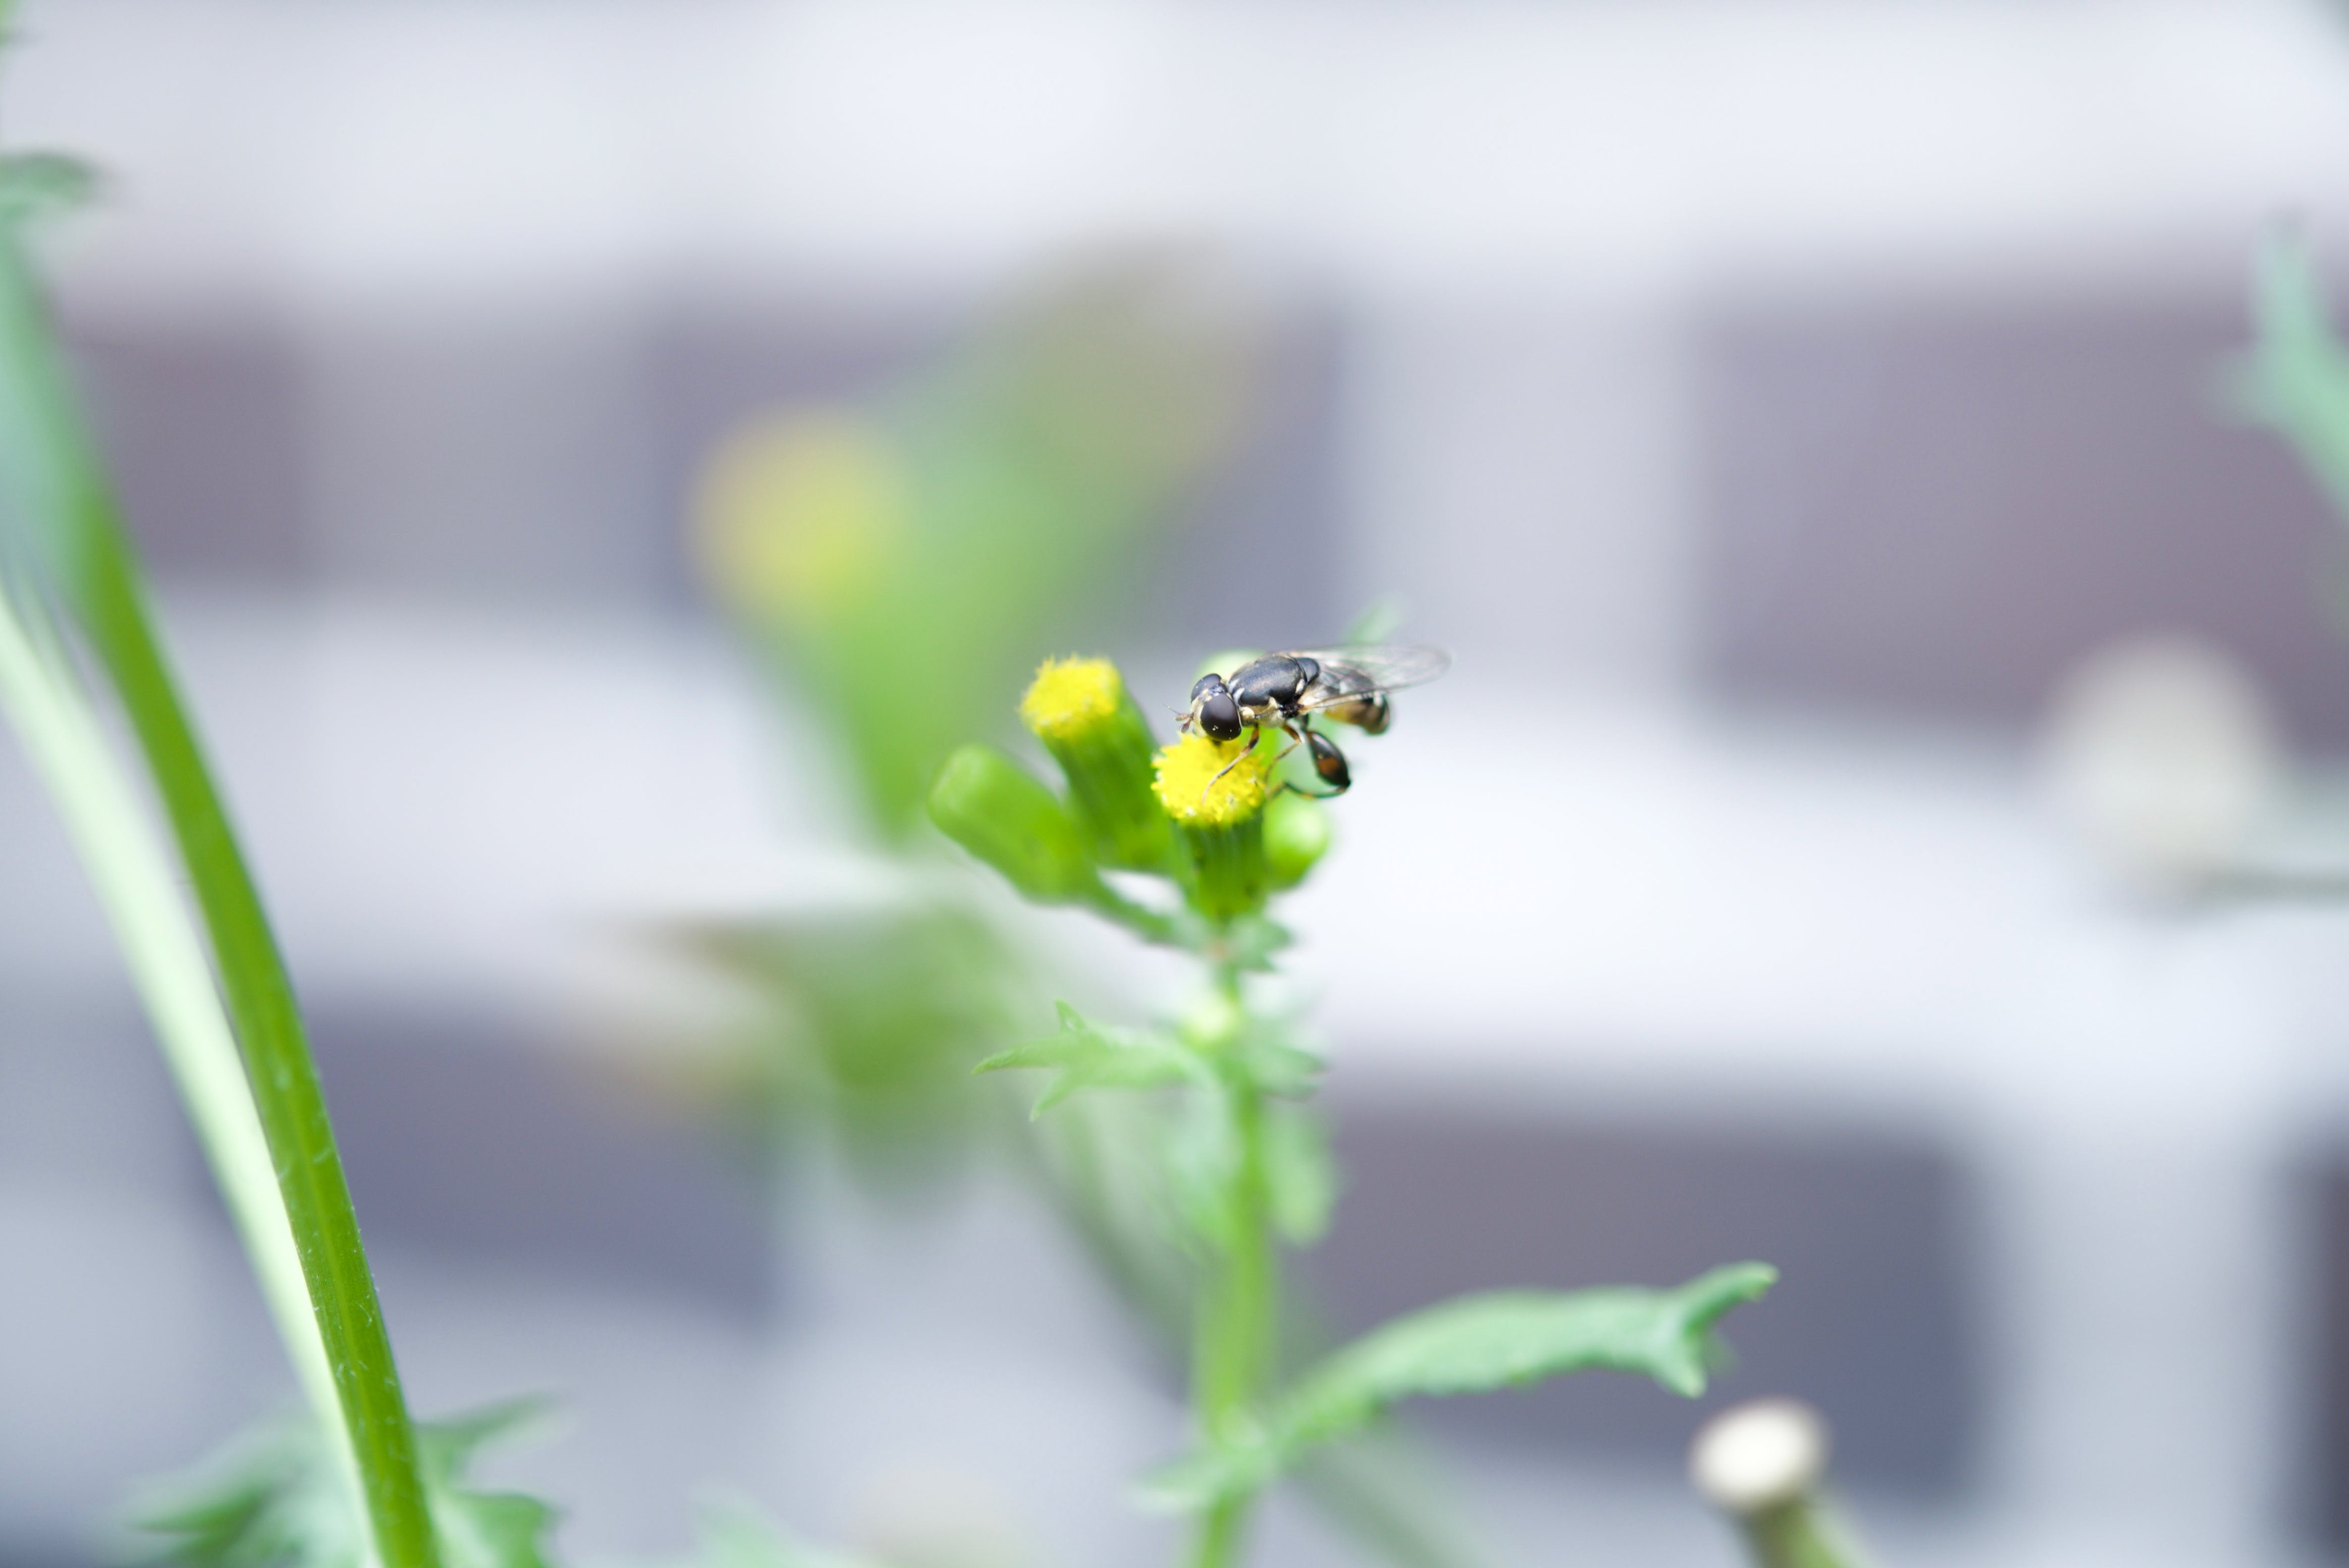 Free stock photo of nature, flying, yellow, animal